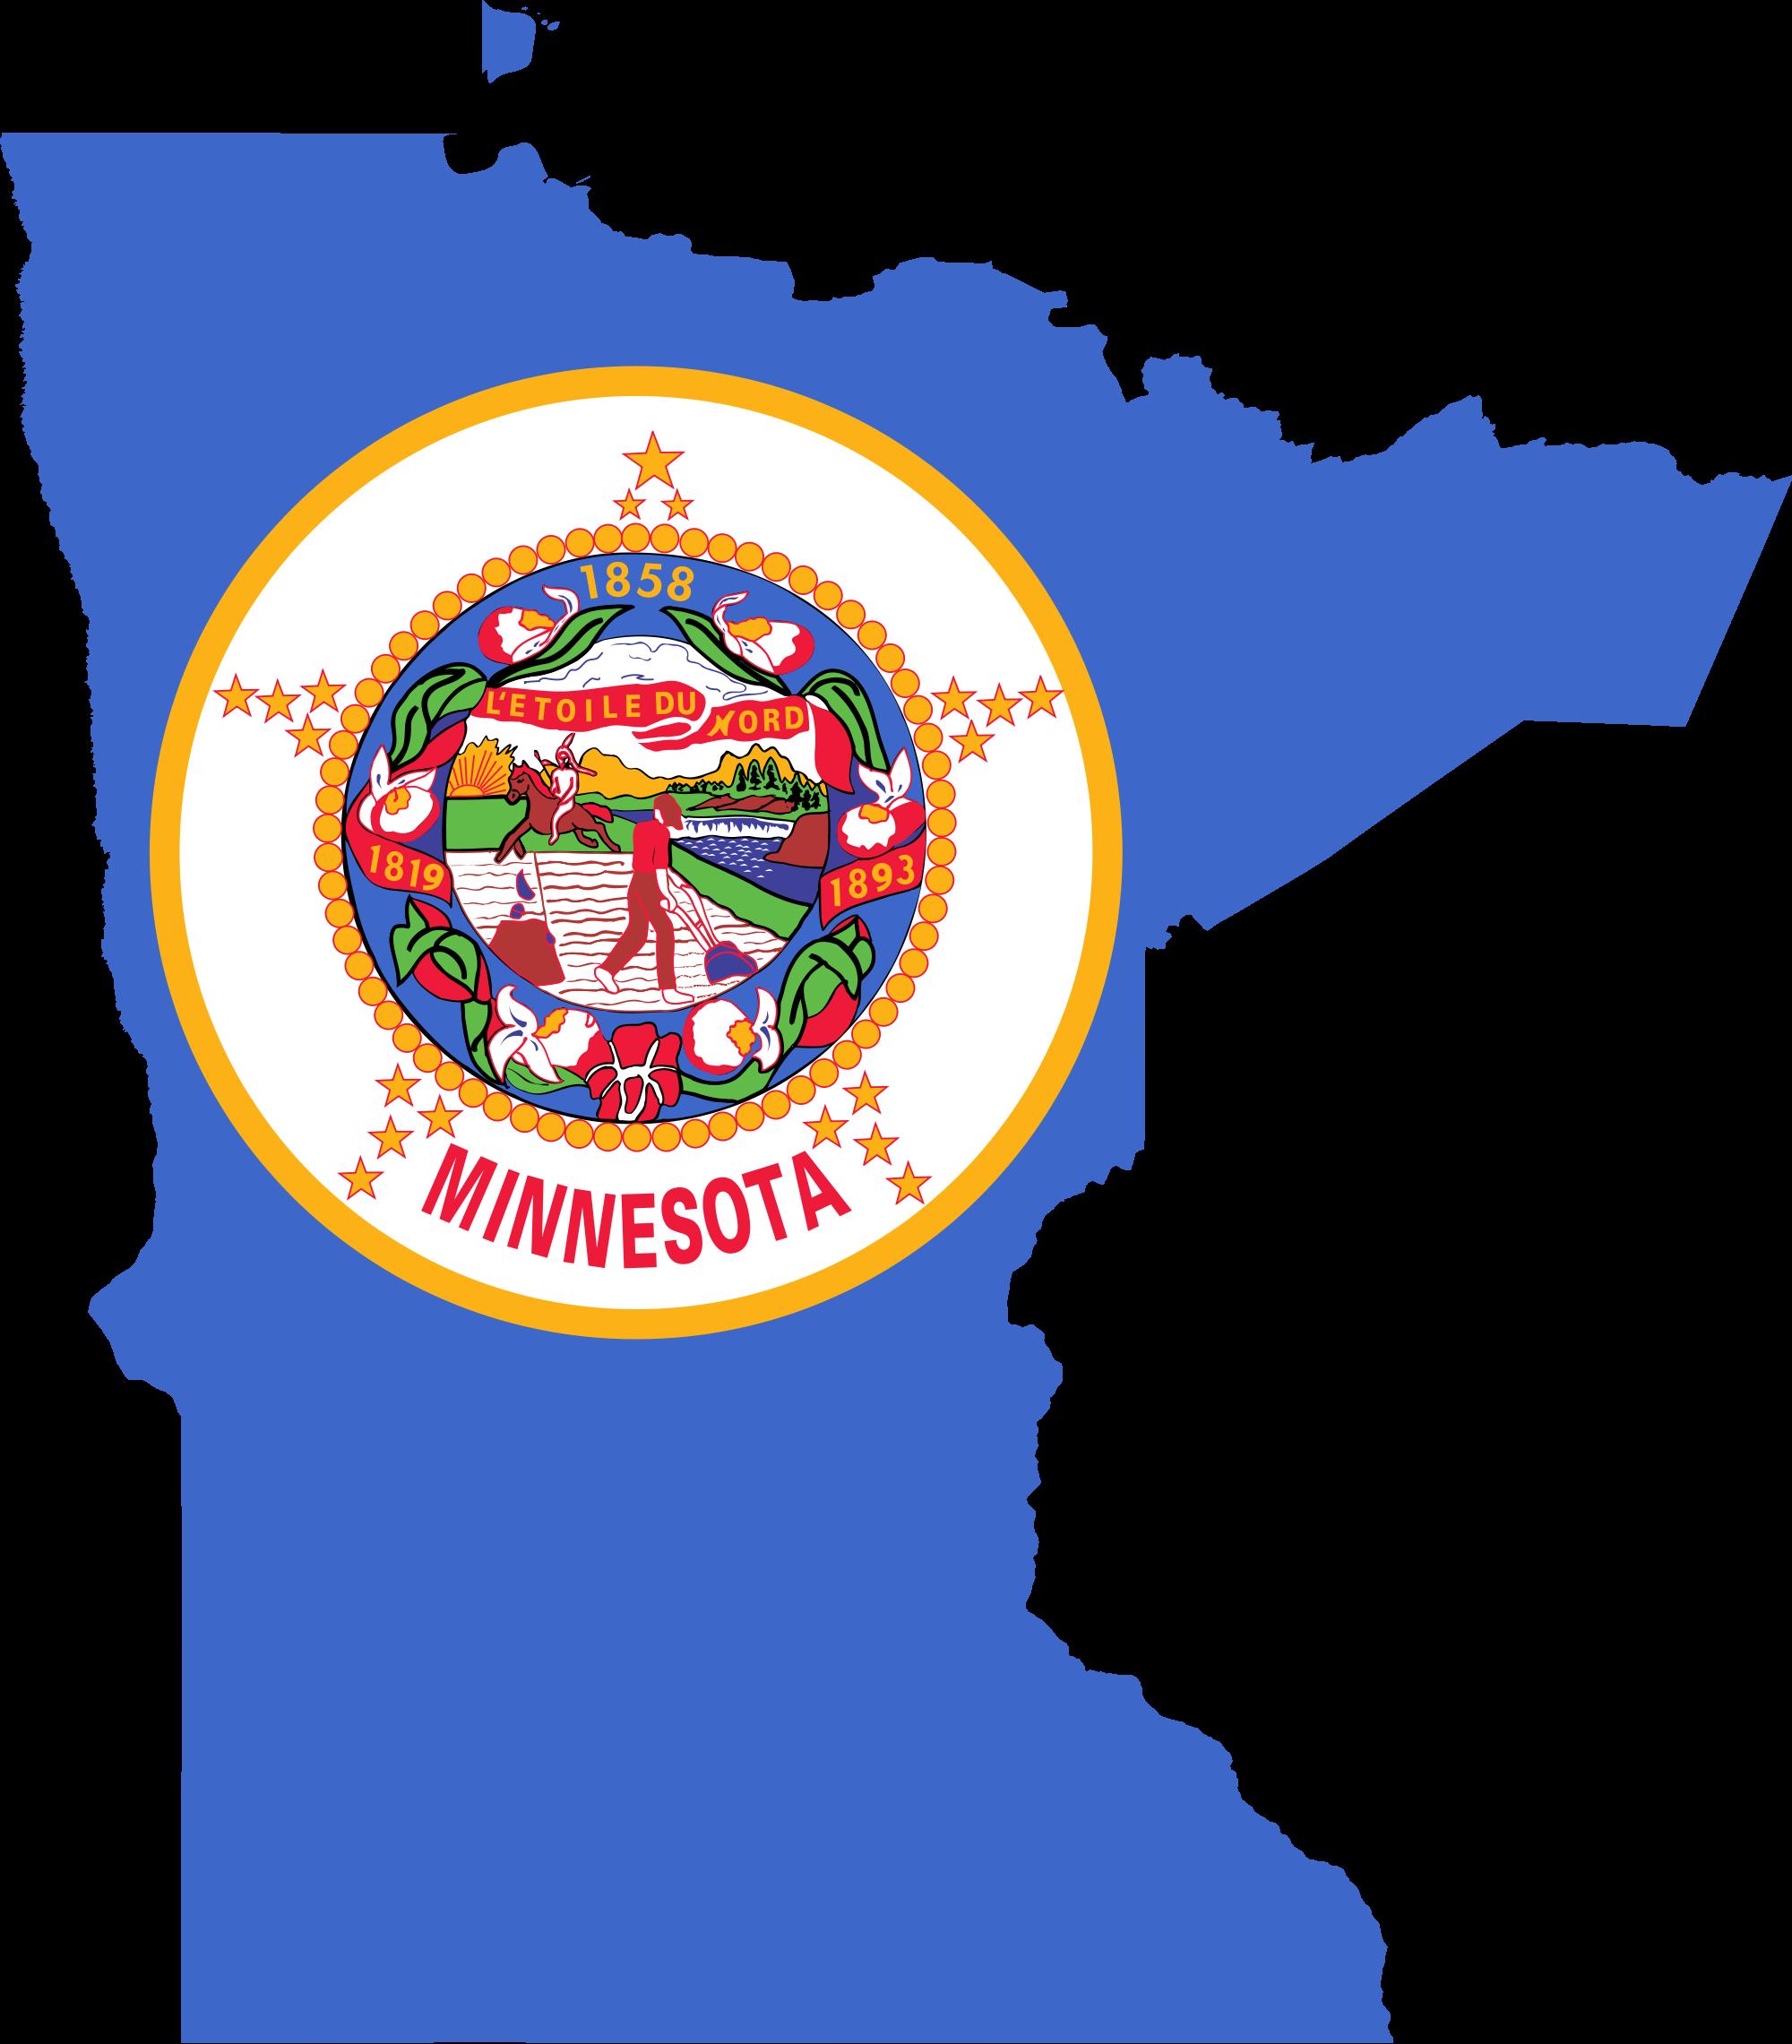 Minnesota.png